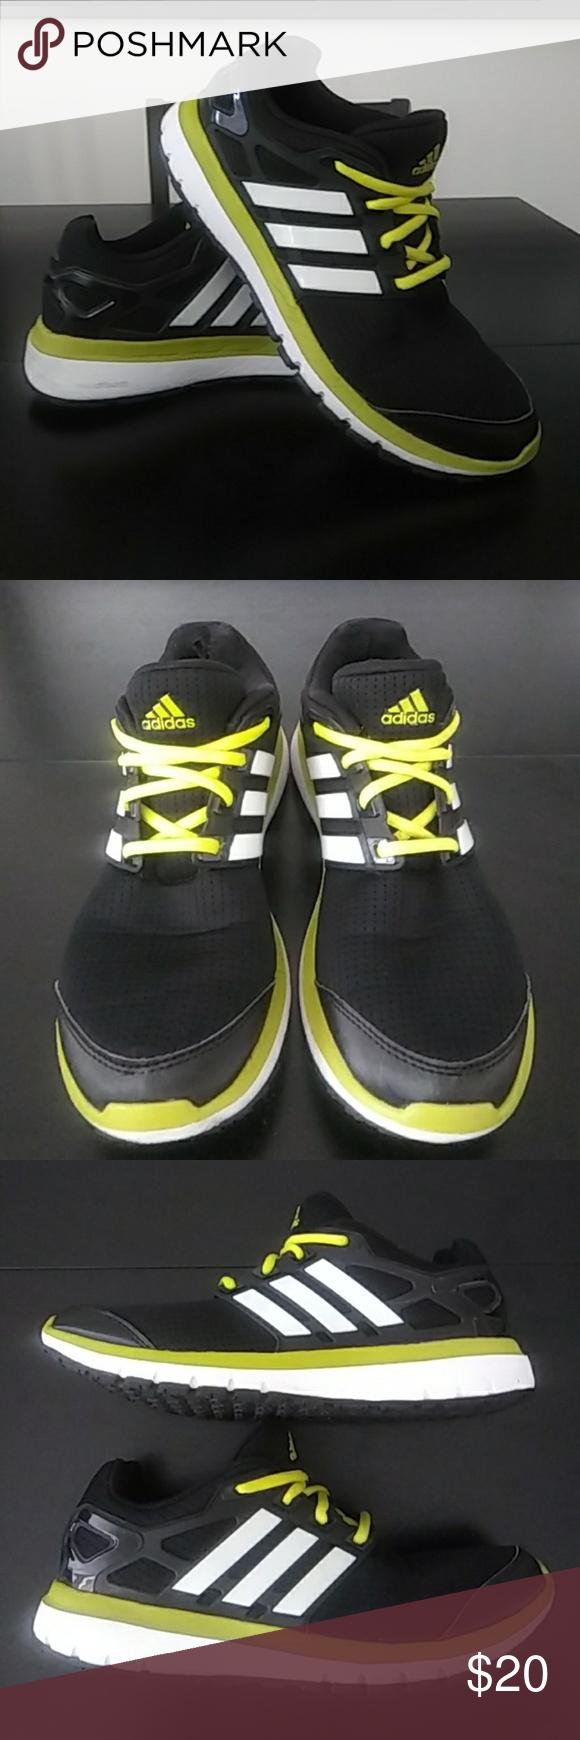 Men's Adidas Running Shoe 789005